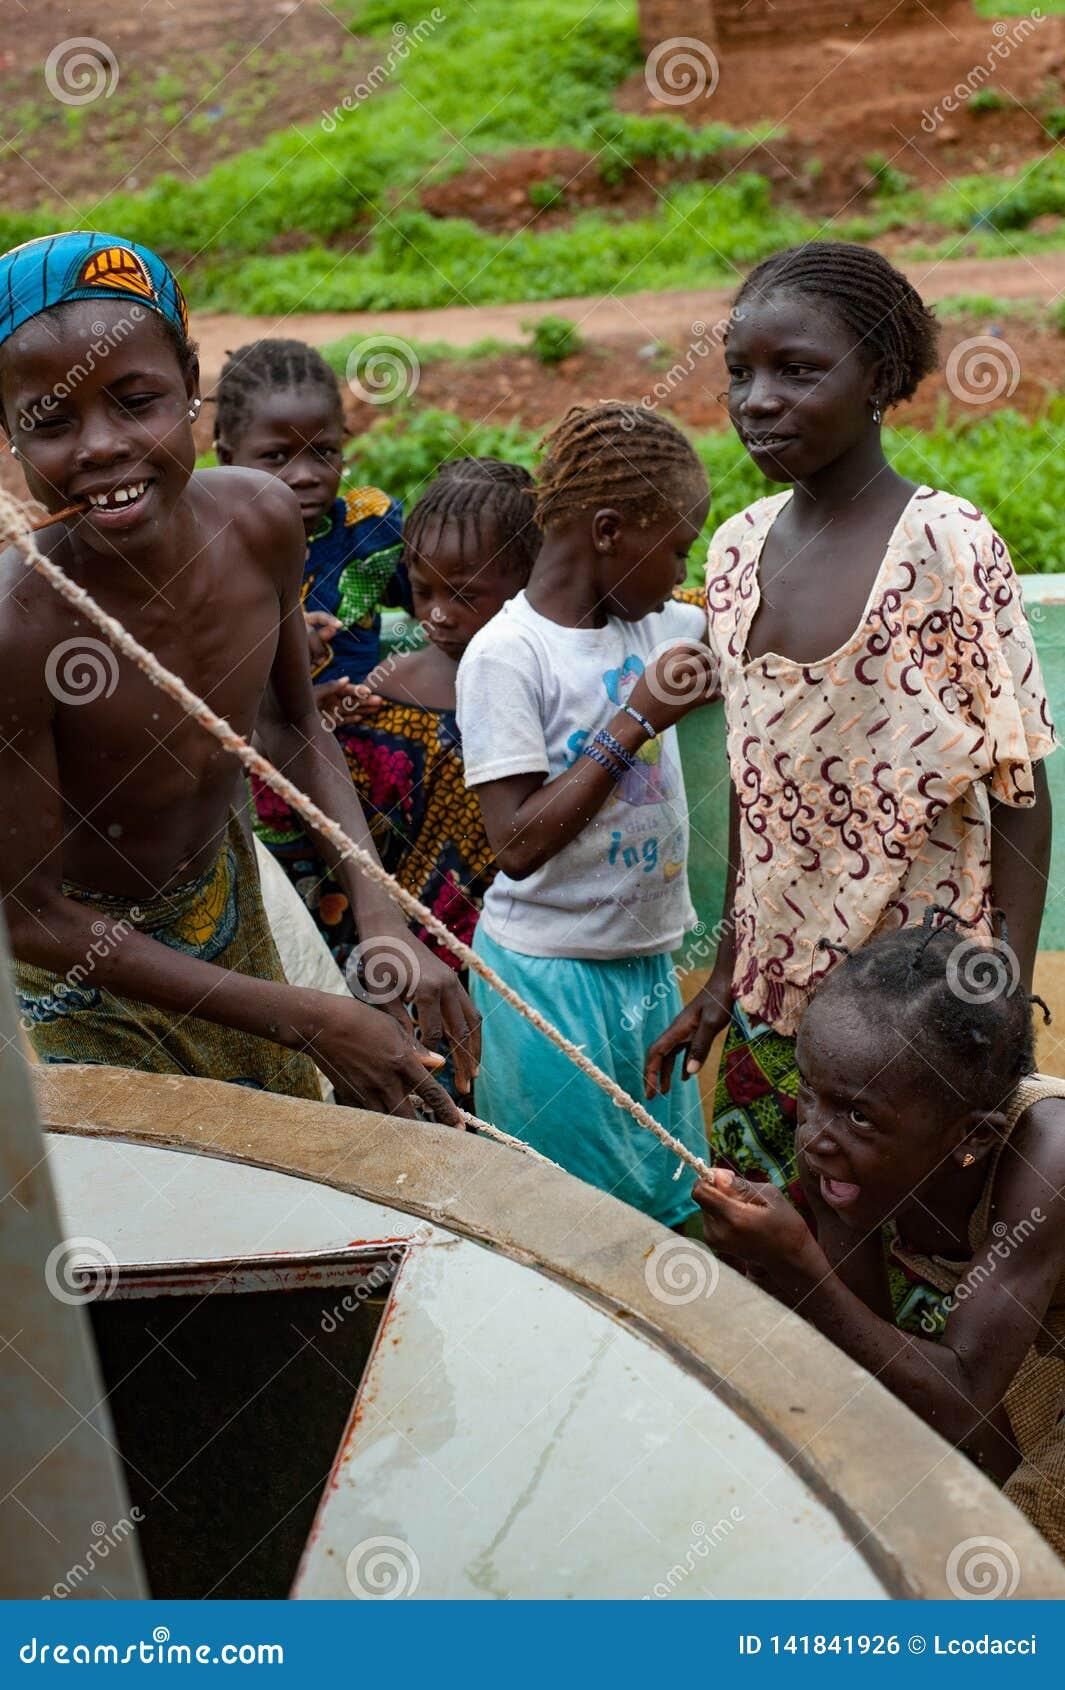 African Rudimentary Well Near Bamako Editorial Photo Image Of Africa Camp 141841926